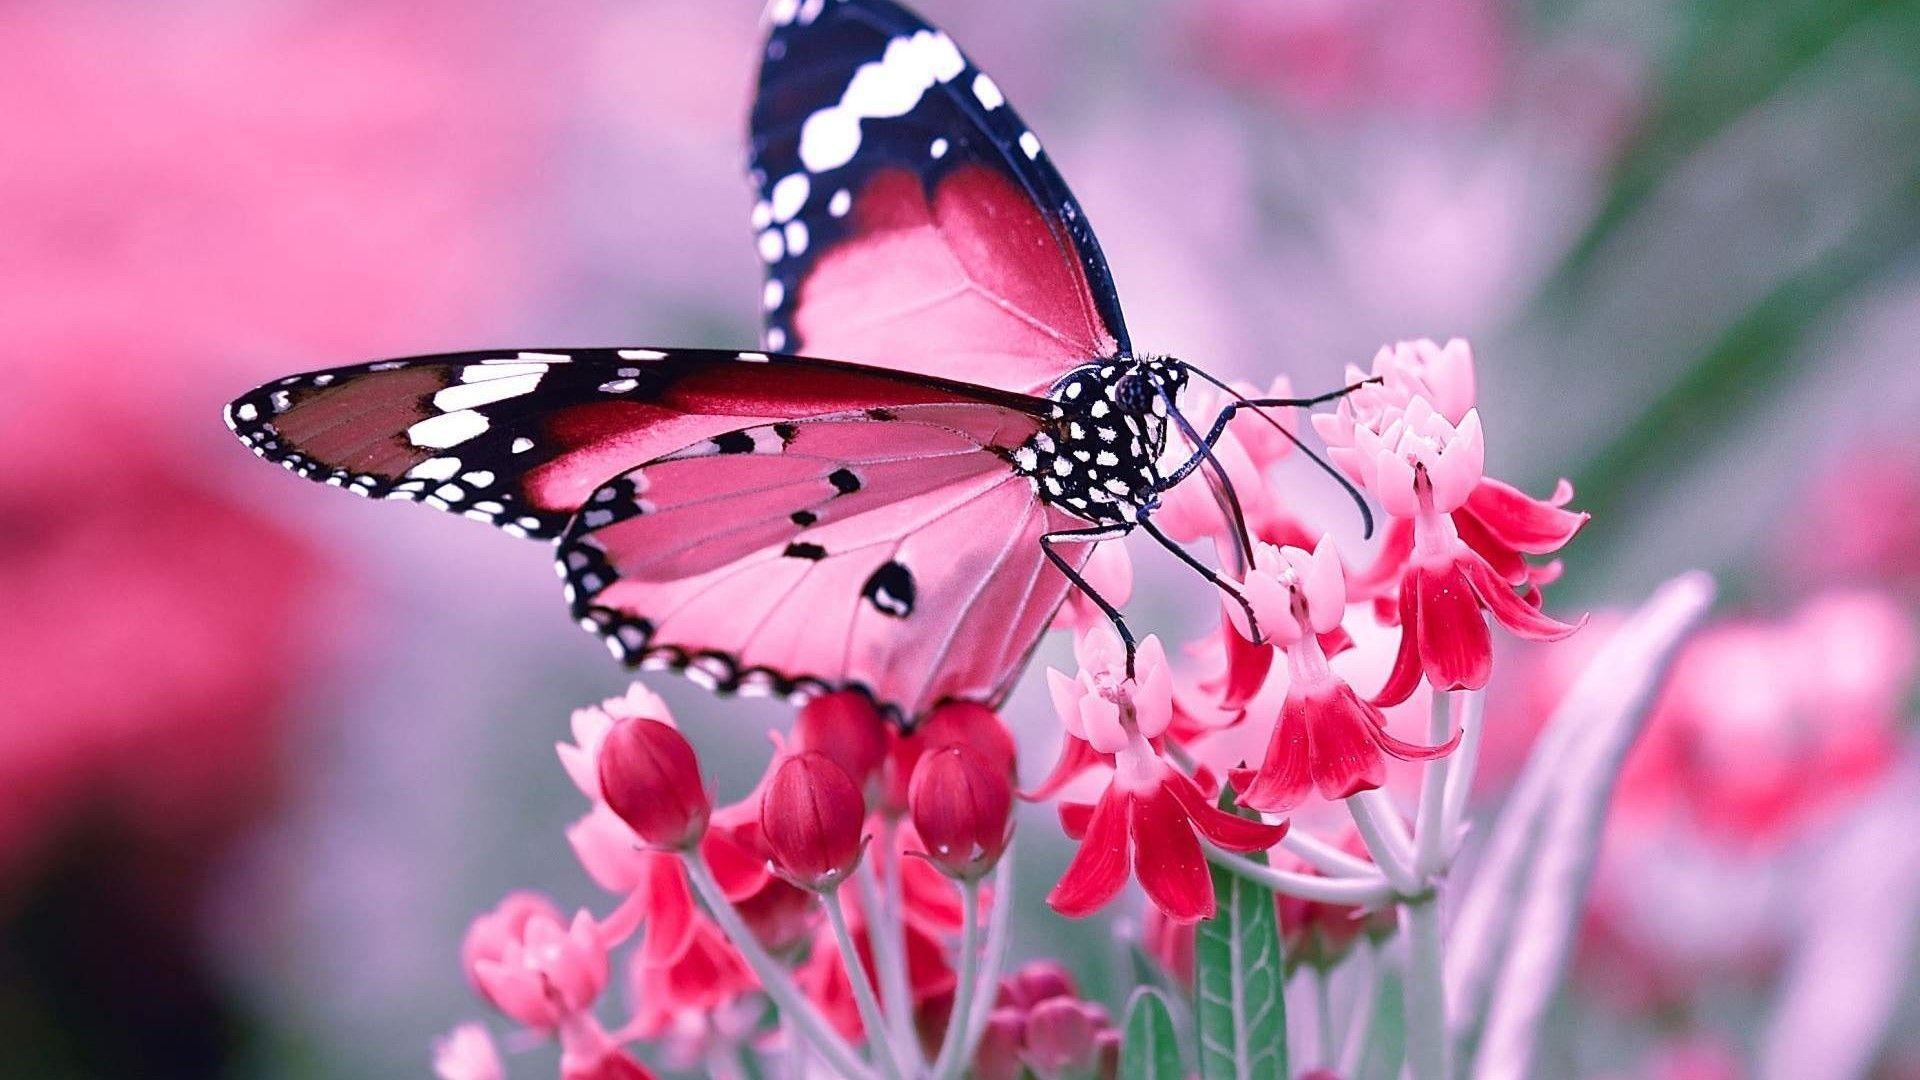 Pink Butterfly Desktop Wallpapers Top Free Pink Butterfly Desktop Backgrounds Wallpaperaccess pink butterfly desktop wallpapers top